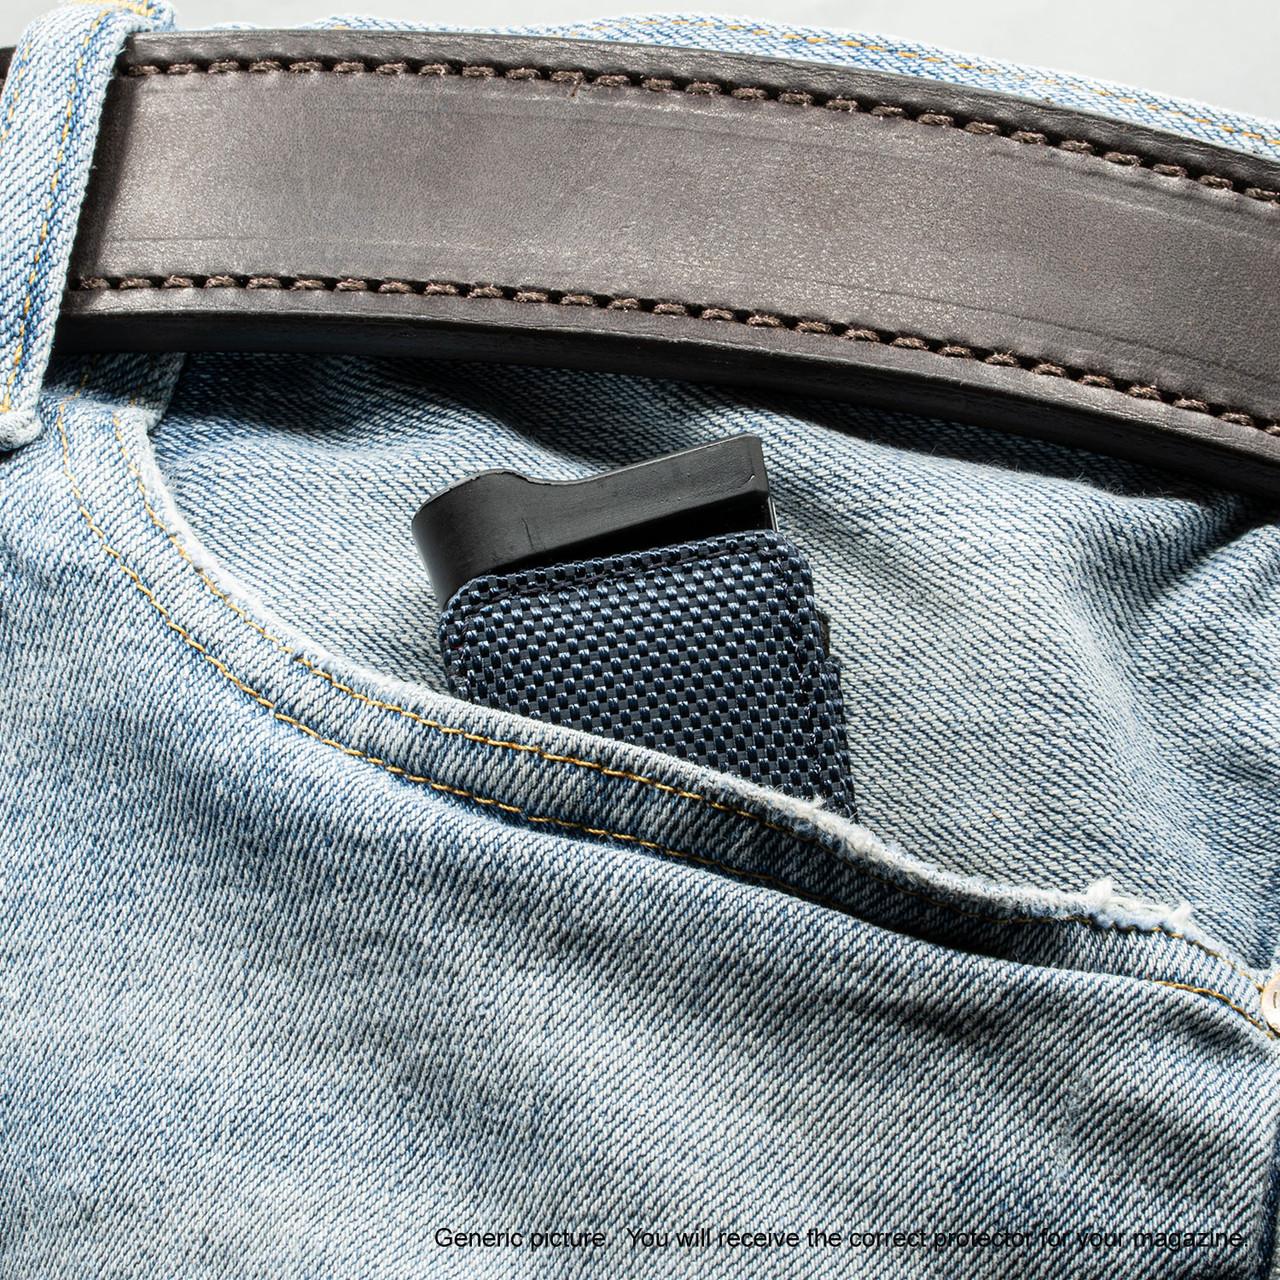 Kahr PM9 Blue Covert Magazine Pocket Protector